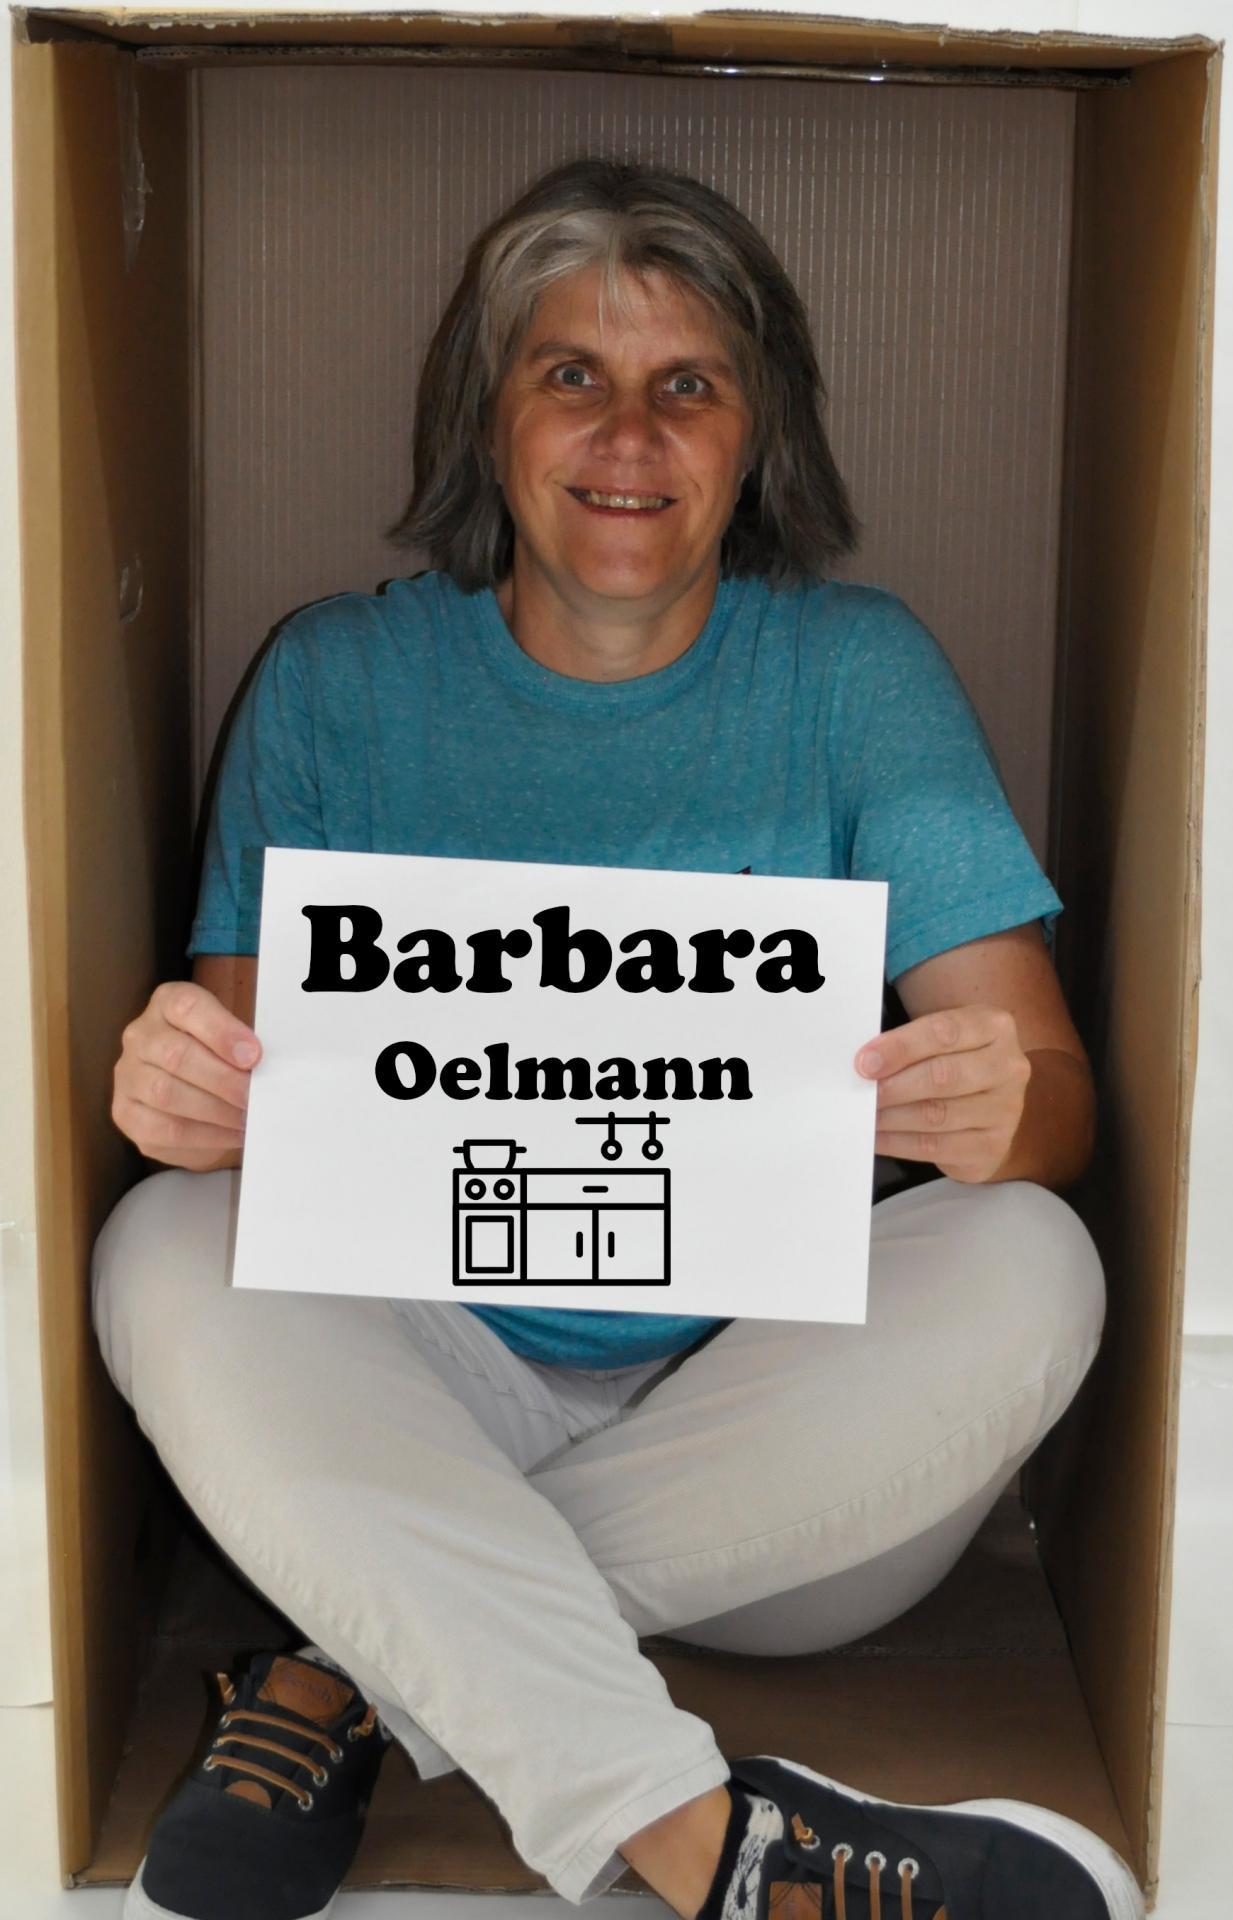 Barbara Oelmann